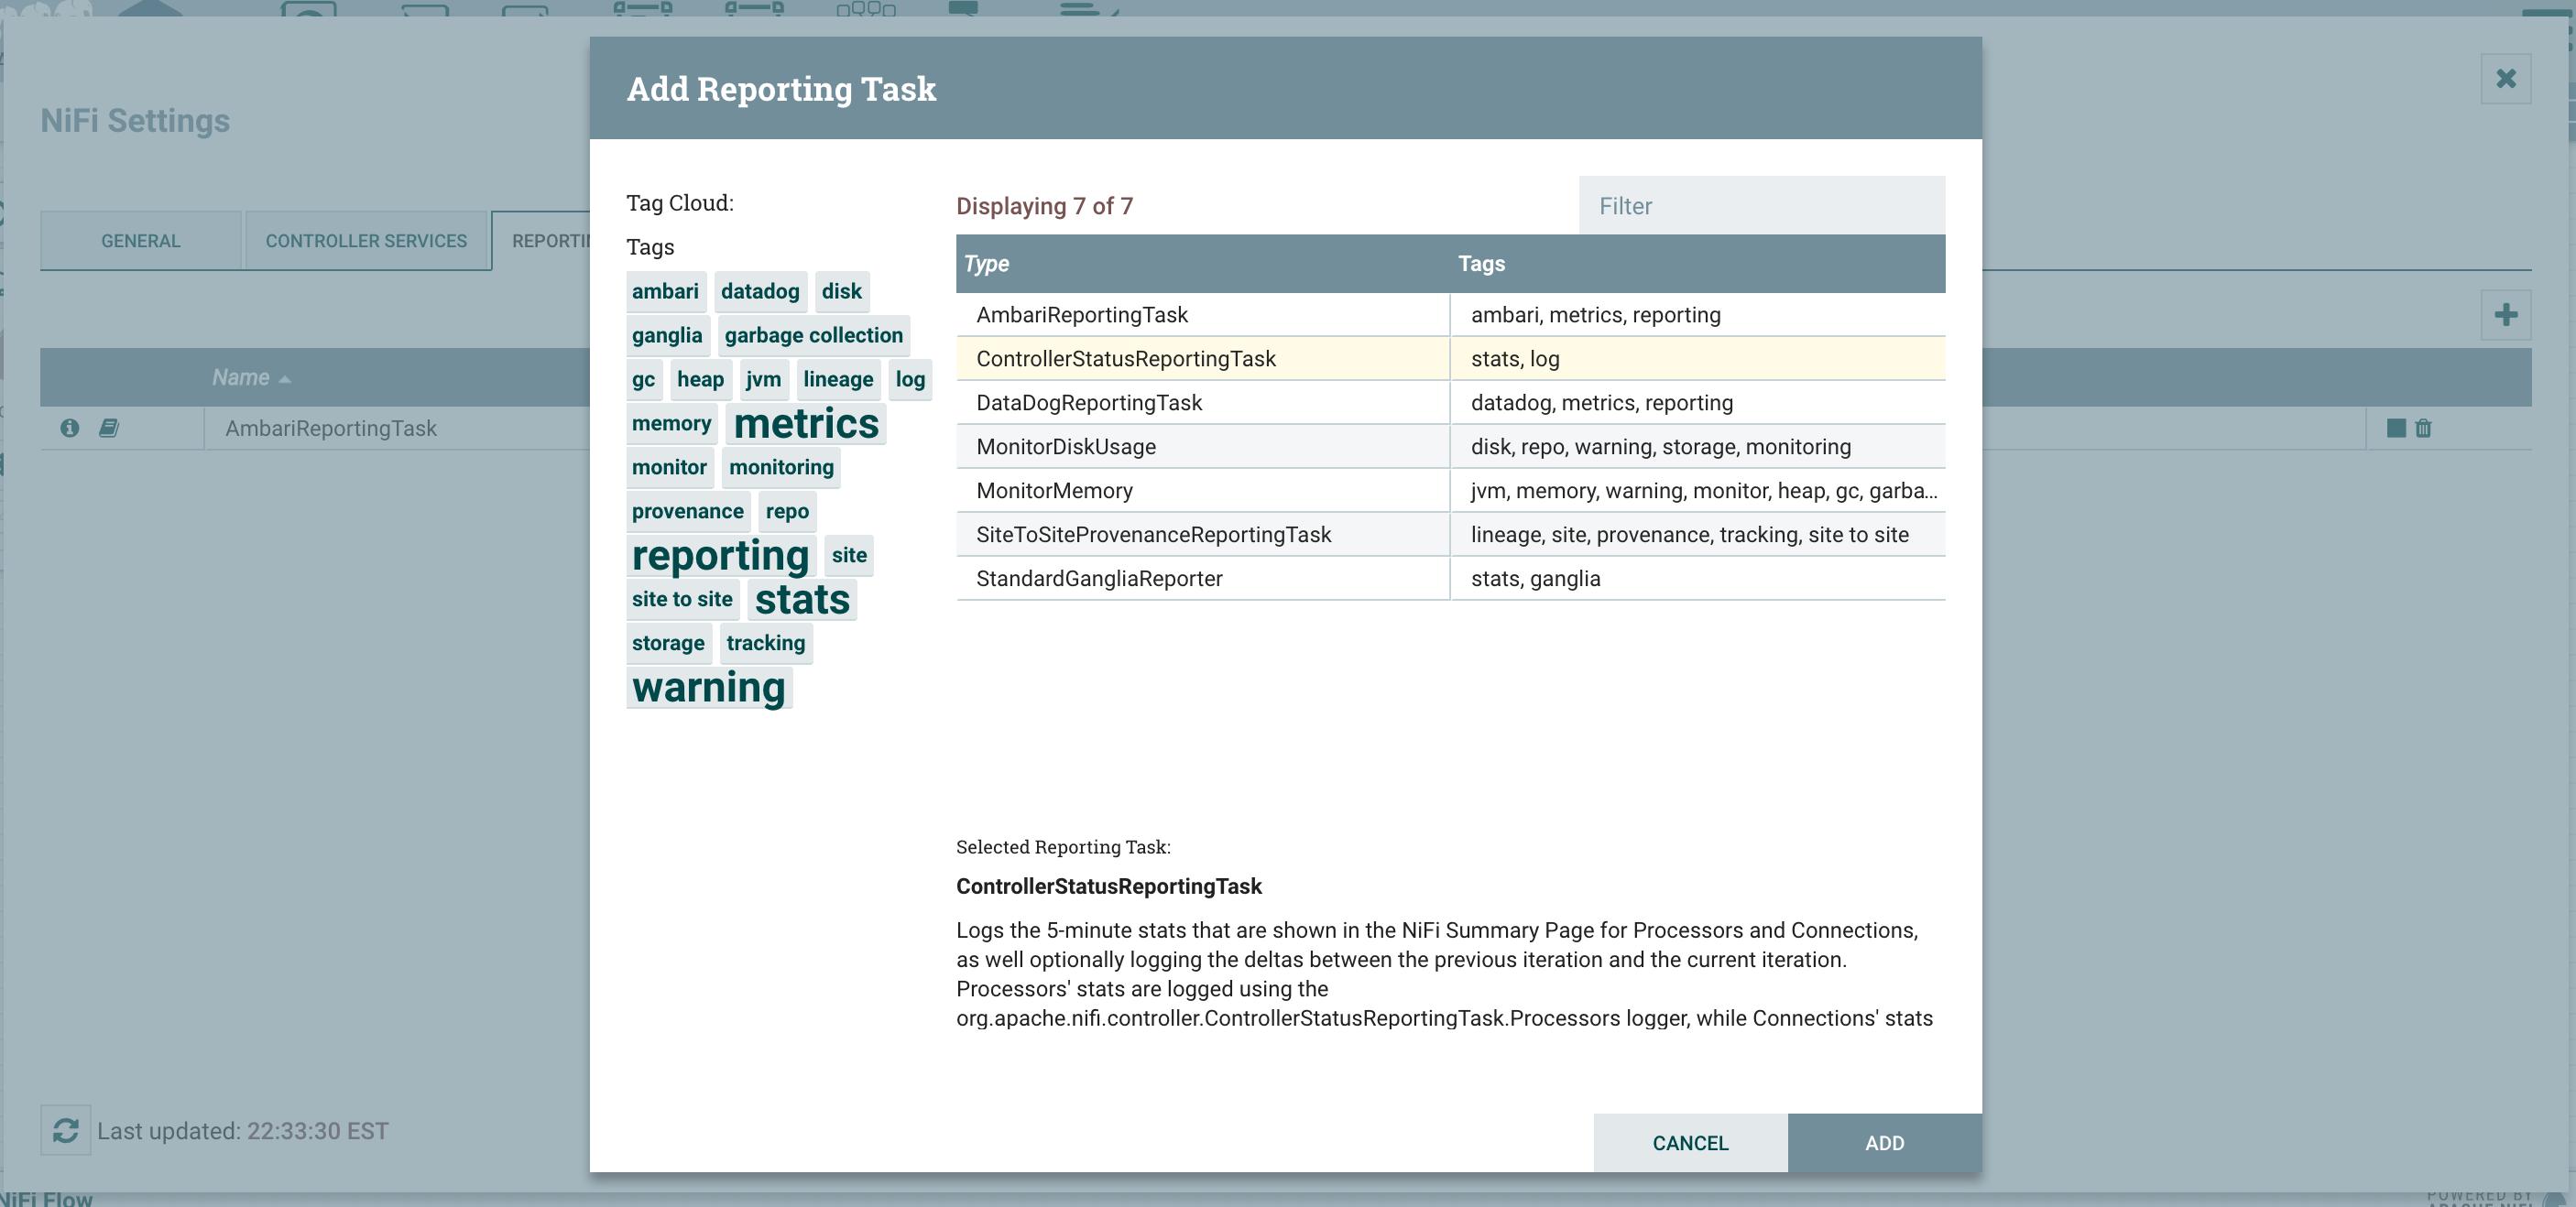 NiFi Monitoring - ControllerStatusReportingTask w